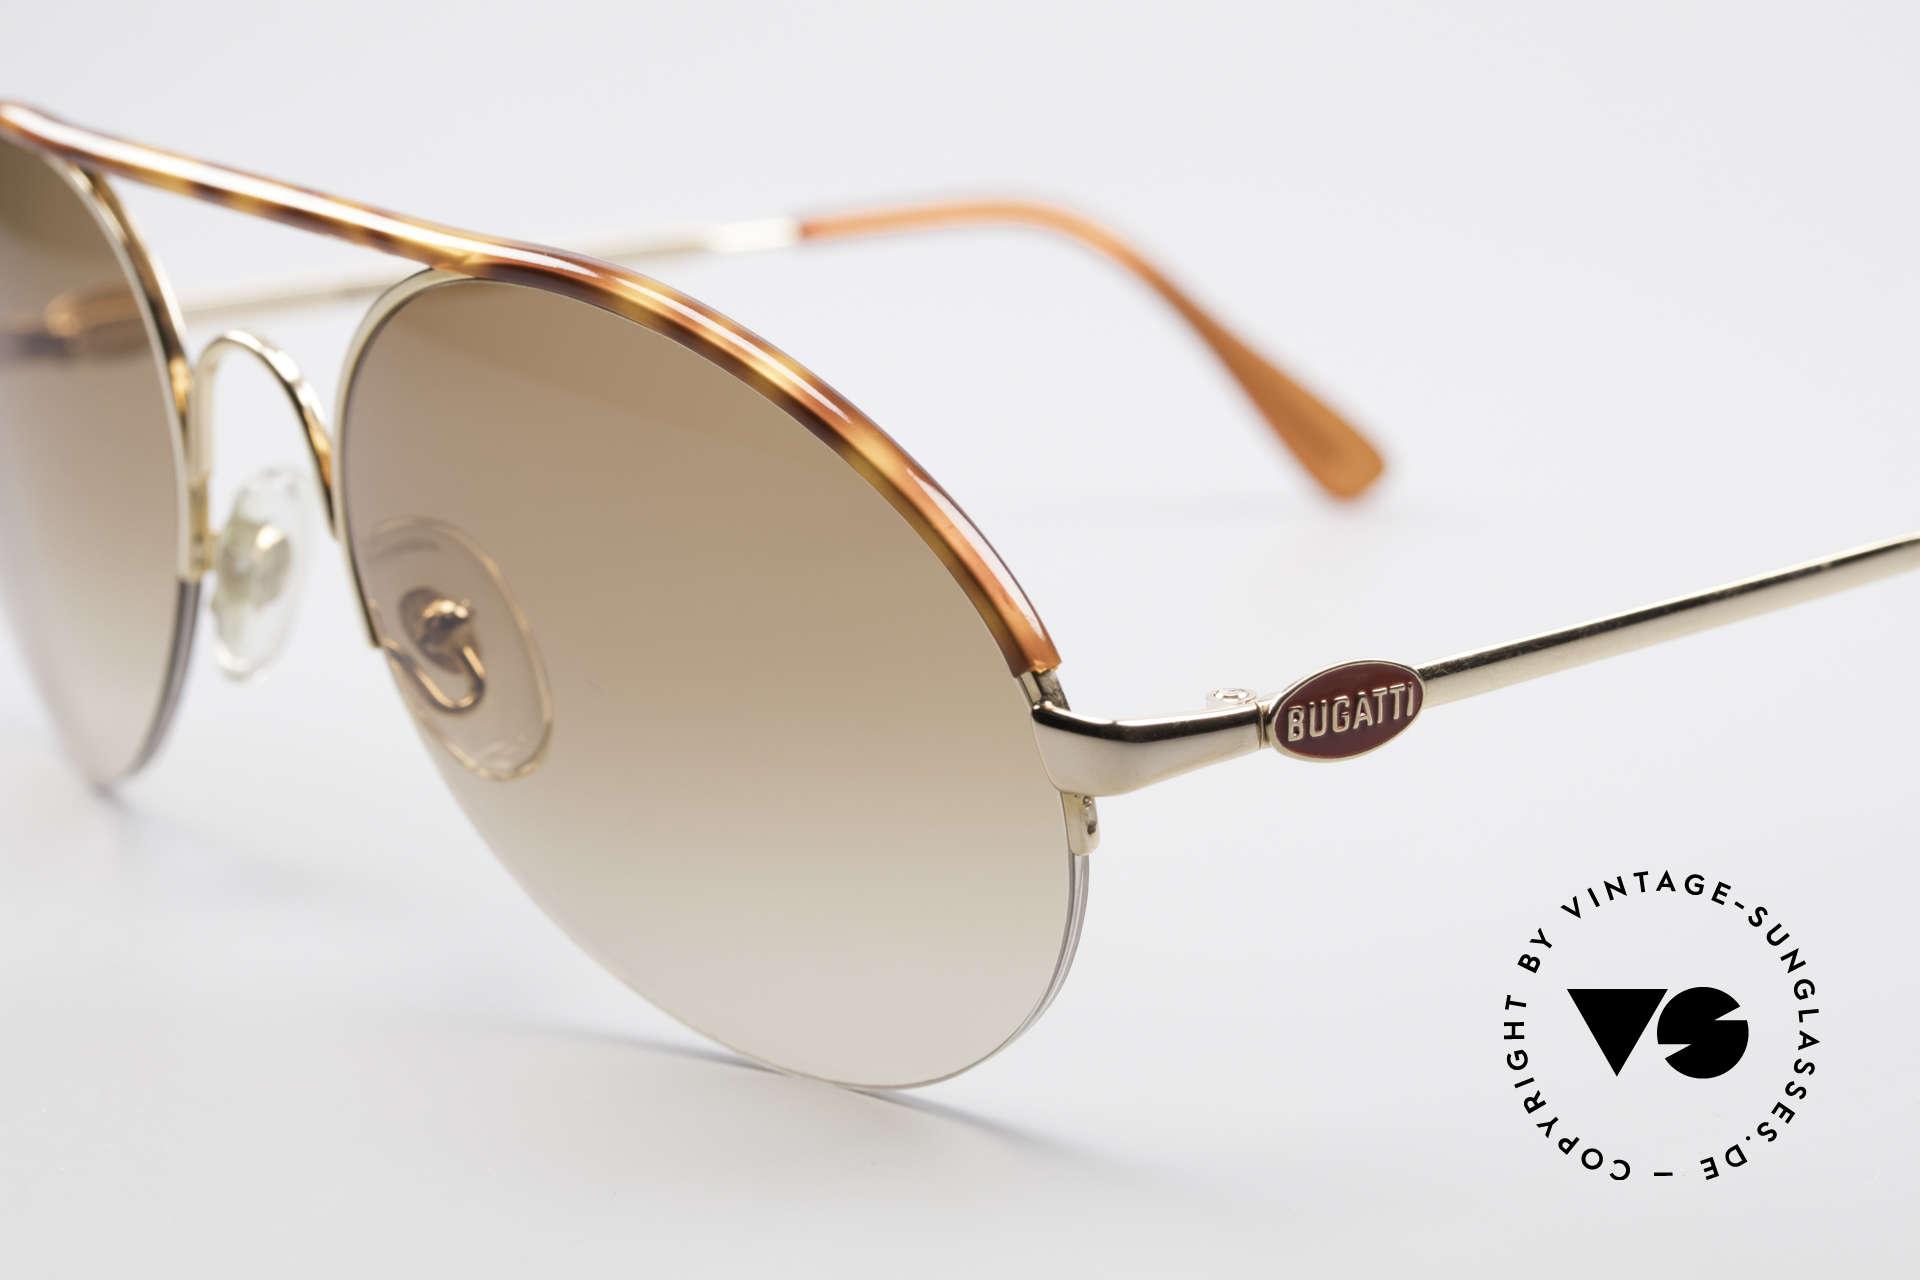 Bugatti 64919 90's Semi Rimless Sunglasses, unworn, NOS (like all our vintage Bugatti eyewear), Made for Men